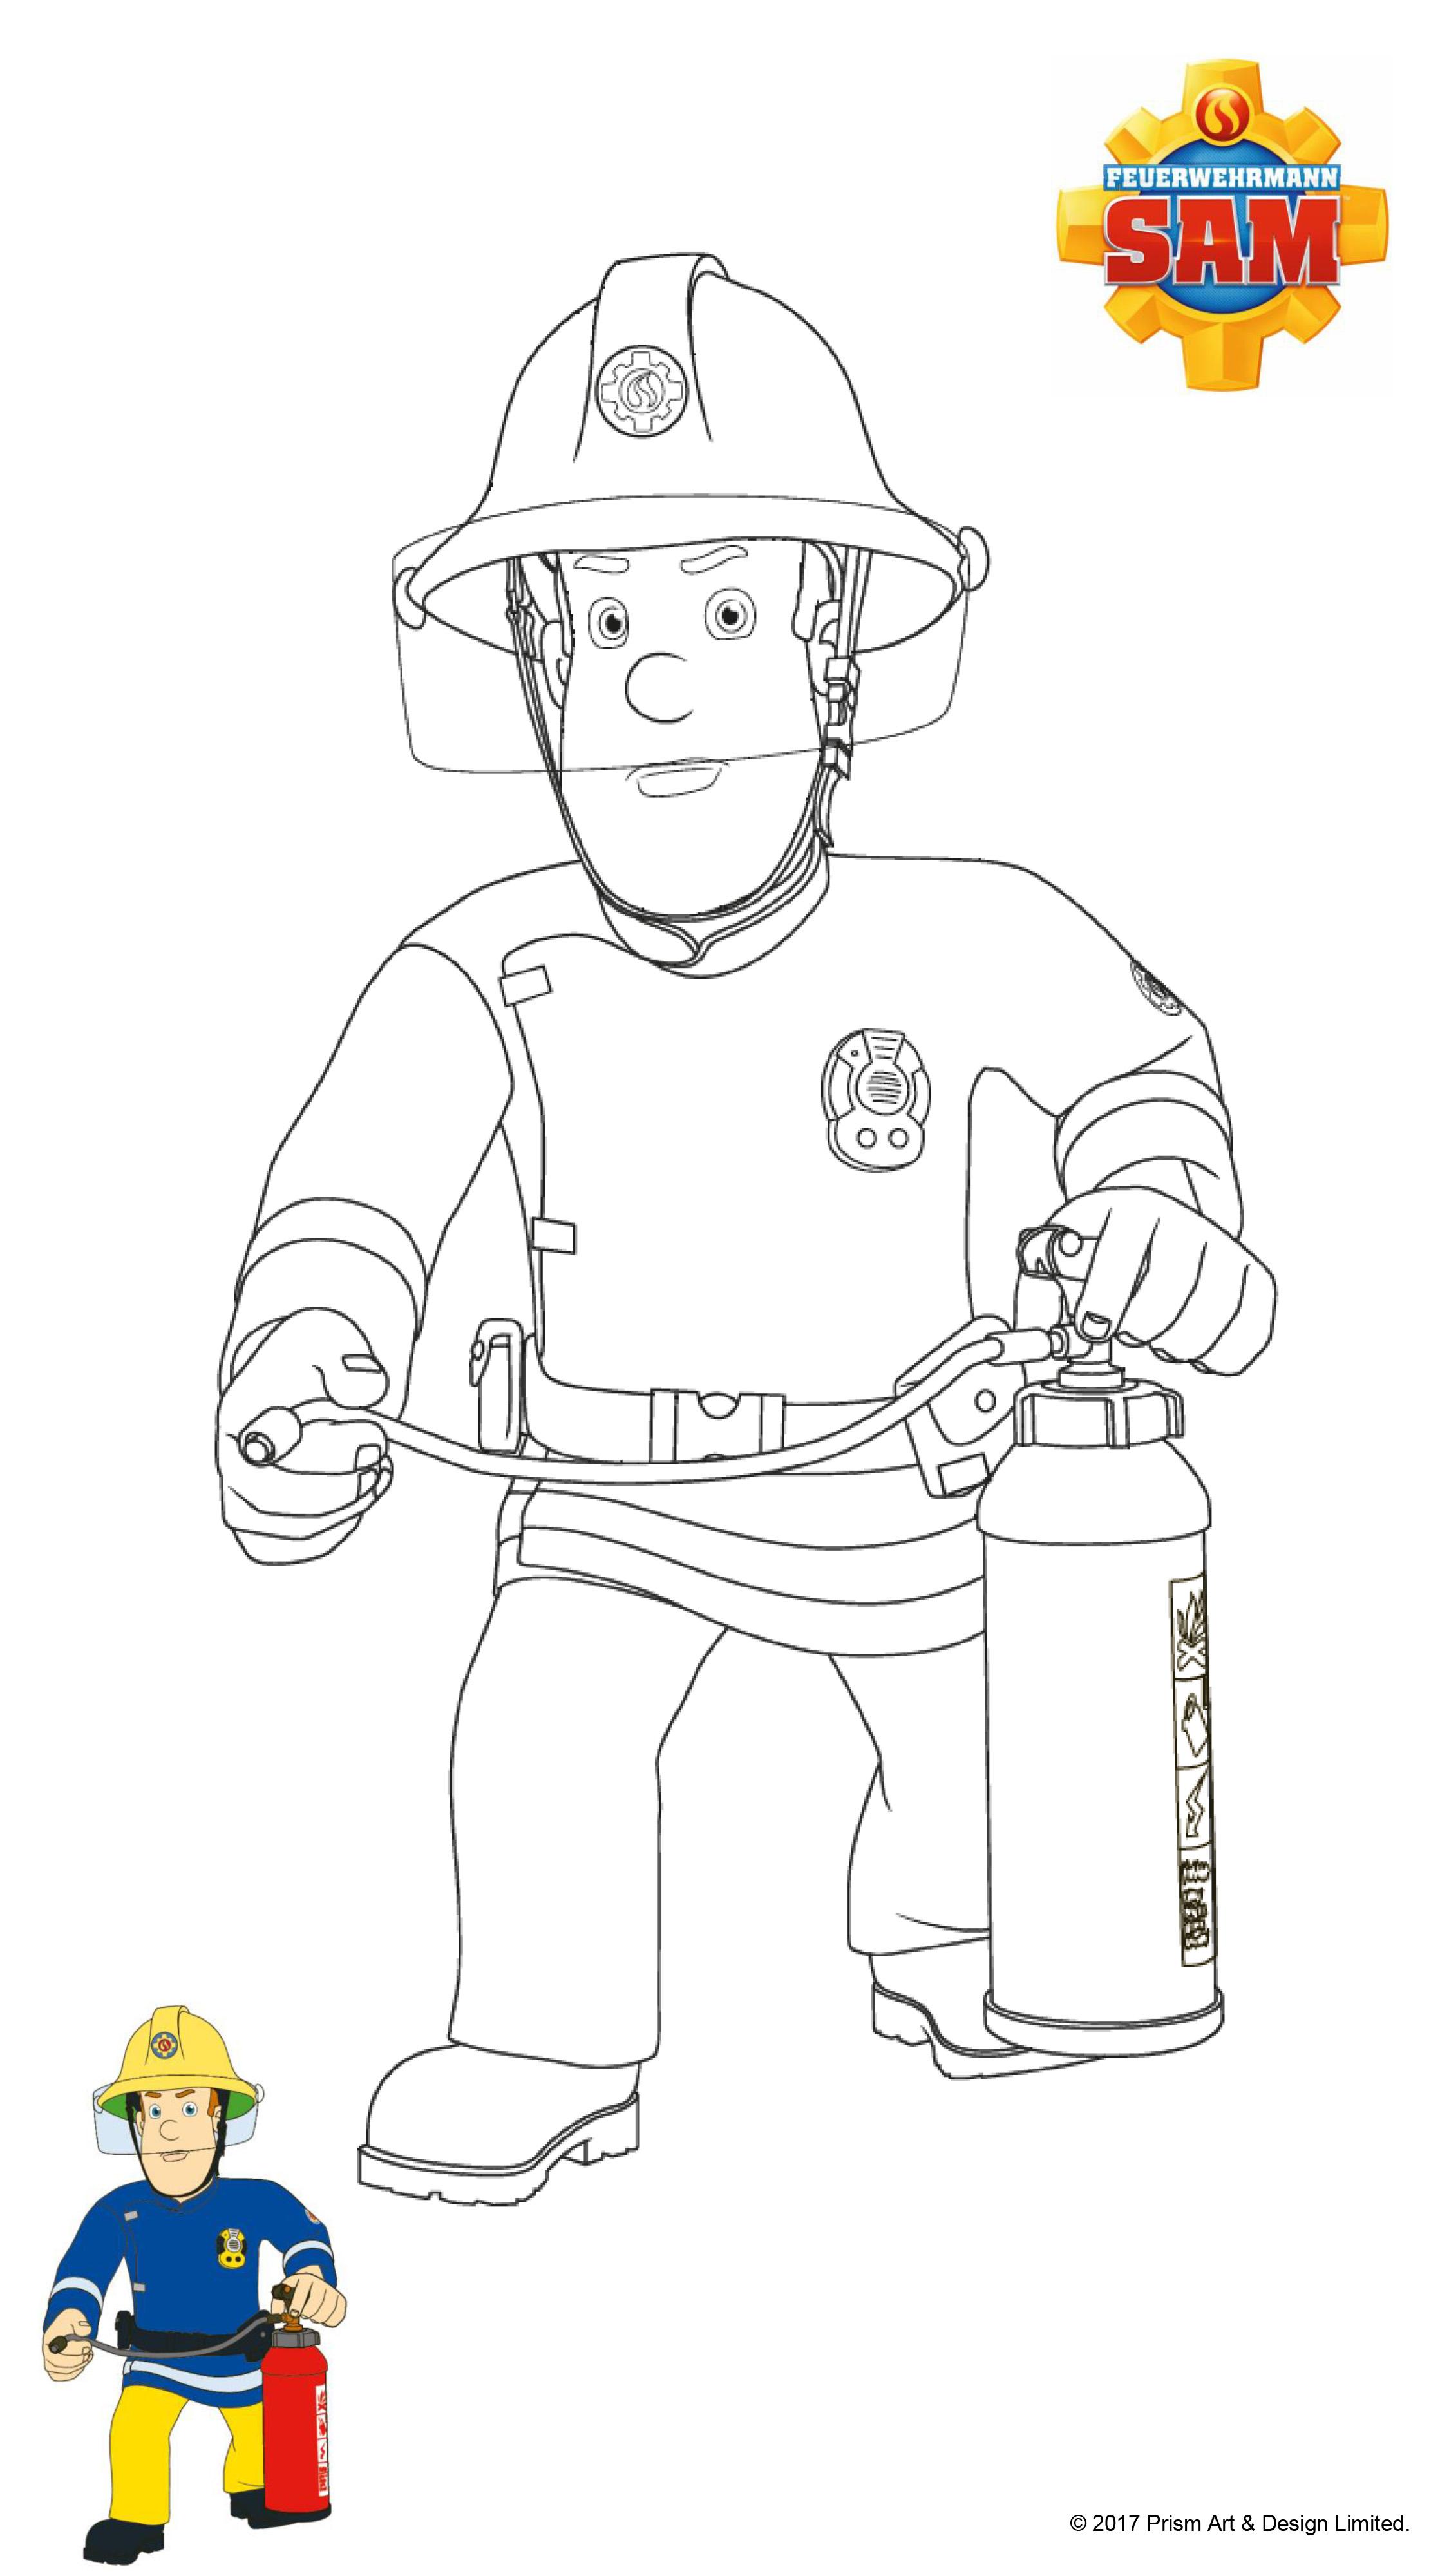 Feuerwehrmann Sam Ausmalbilder Kika : Feuerwehrmann Sam Ausmalbilder Mytoys Blog